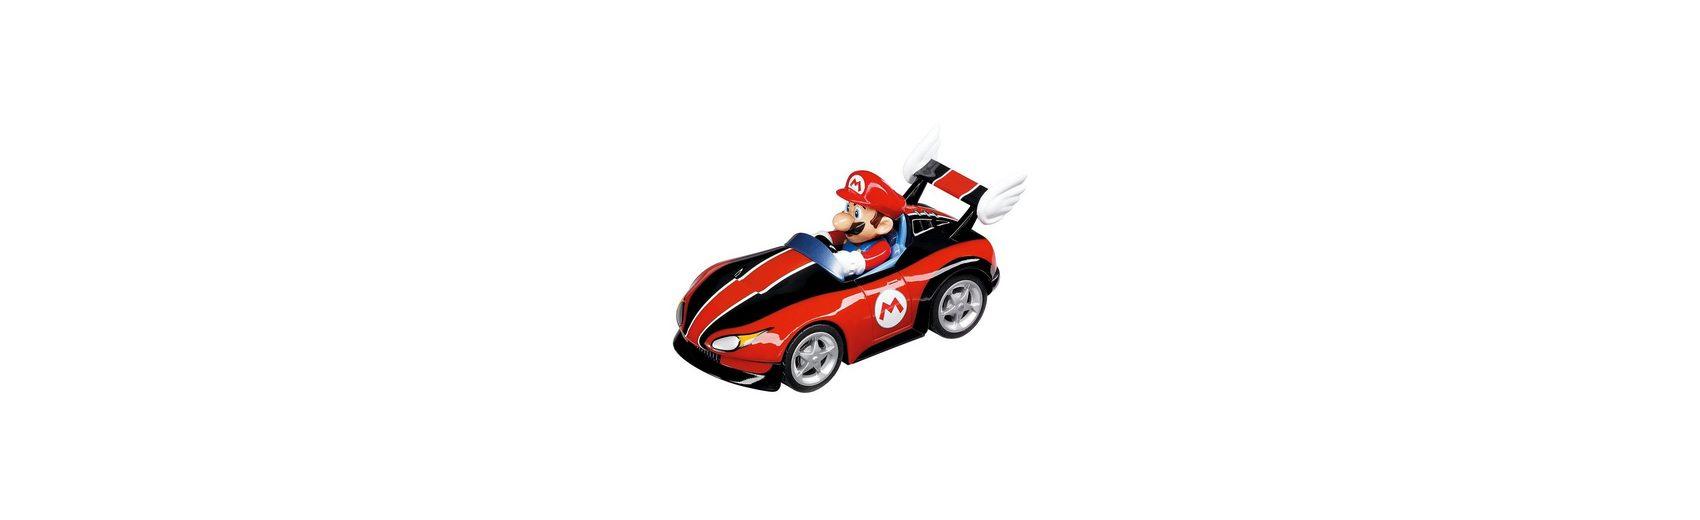 Carrera GO!!! 61259 Car Mario Kart Wii Wild Wing + Mario